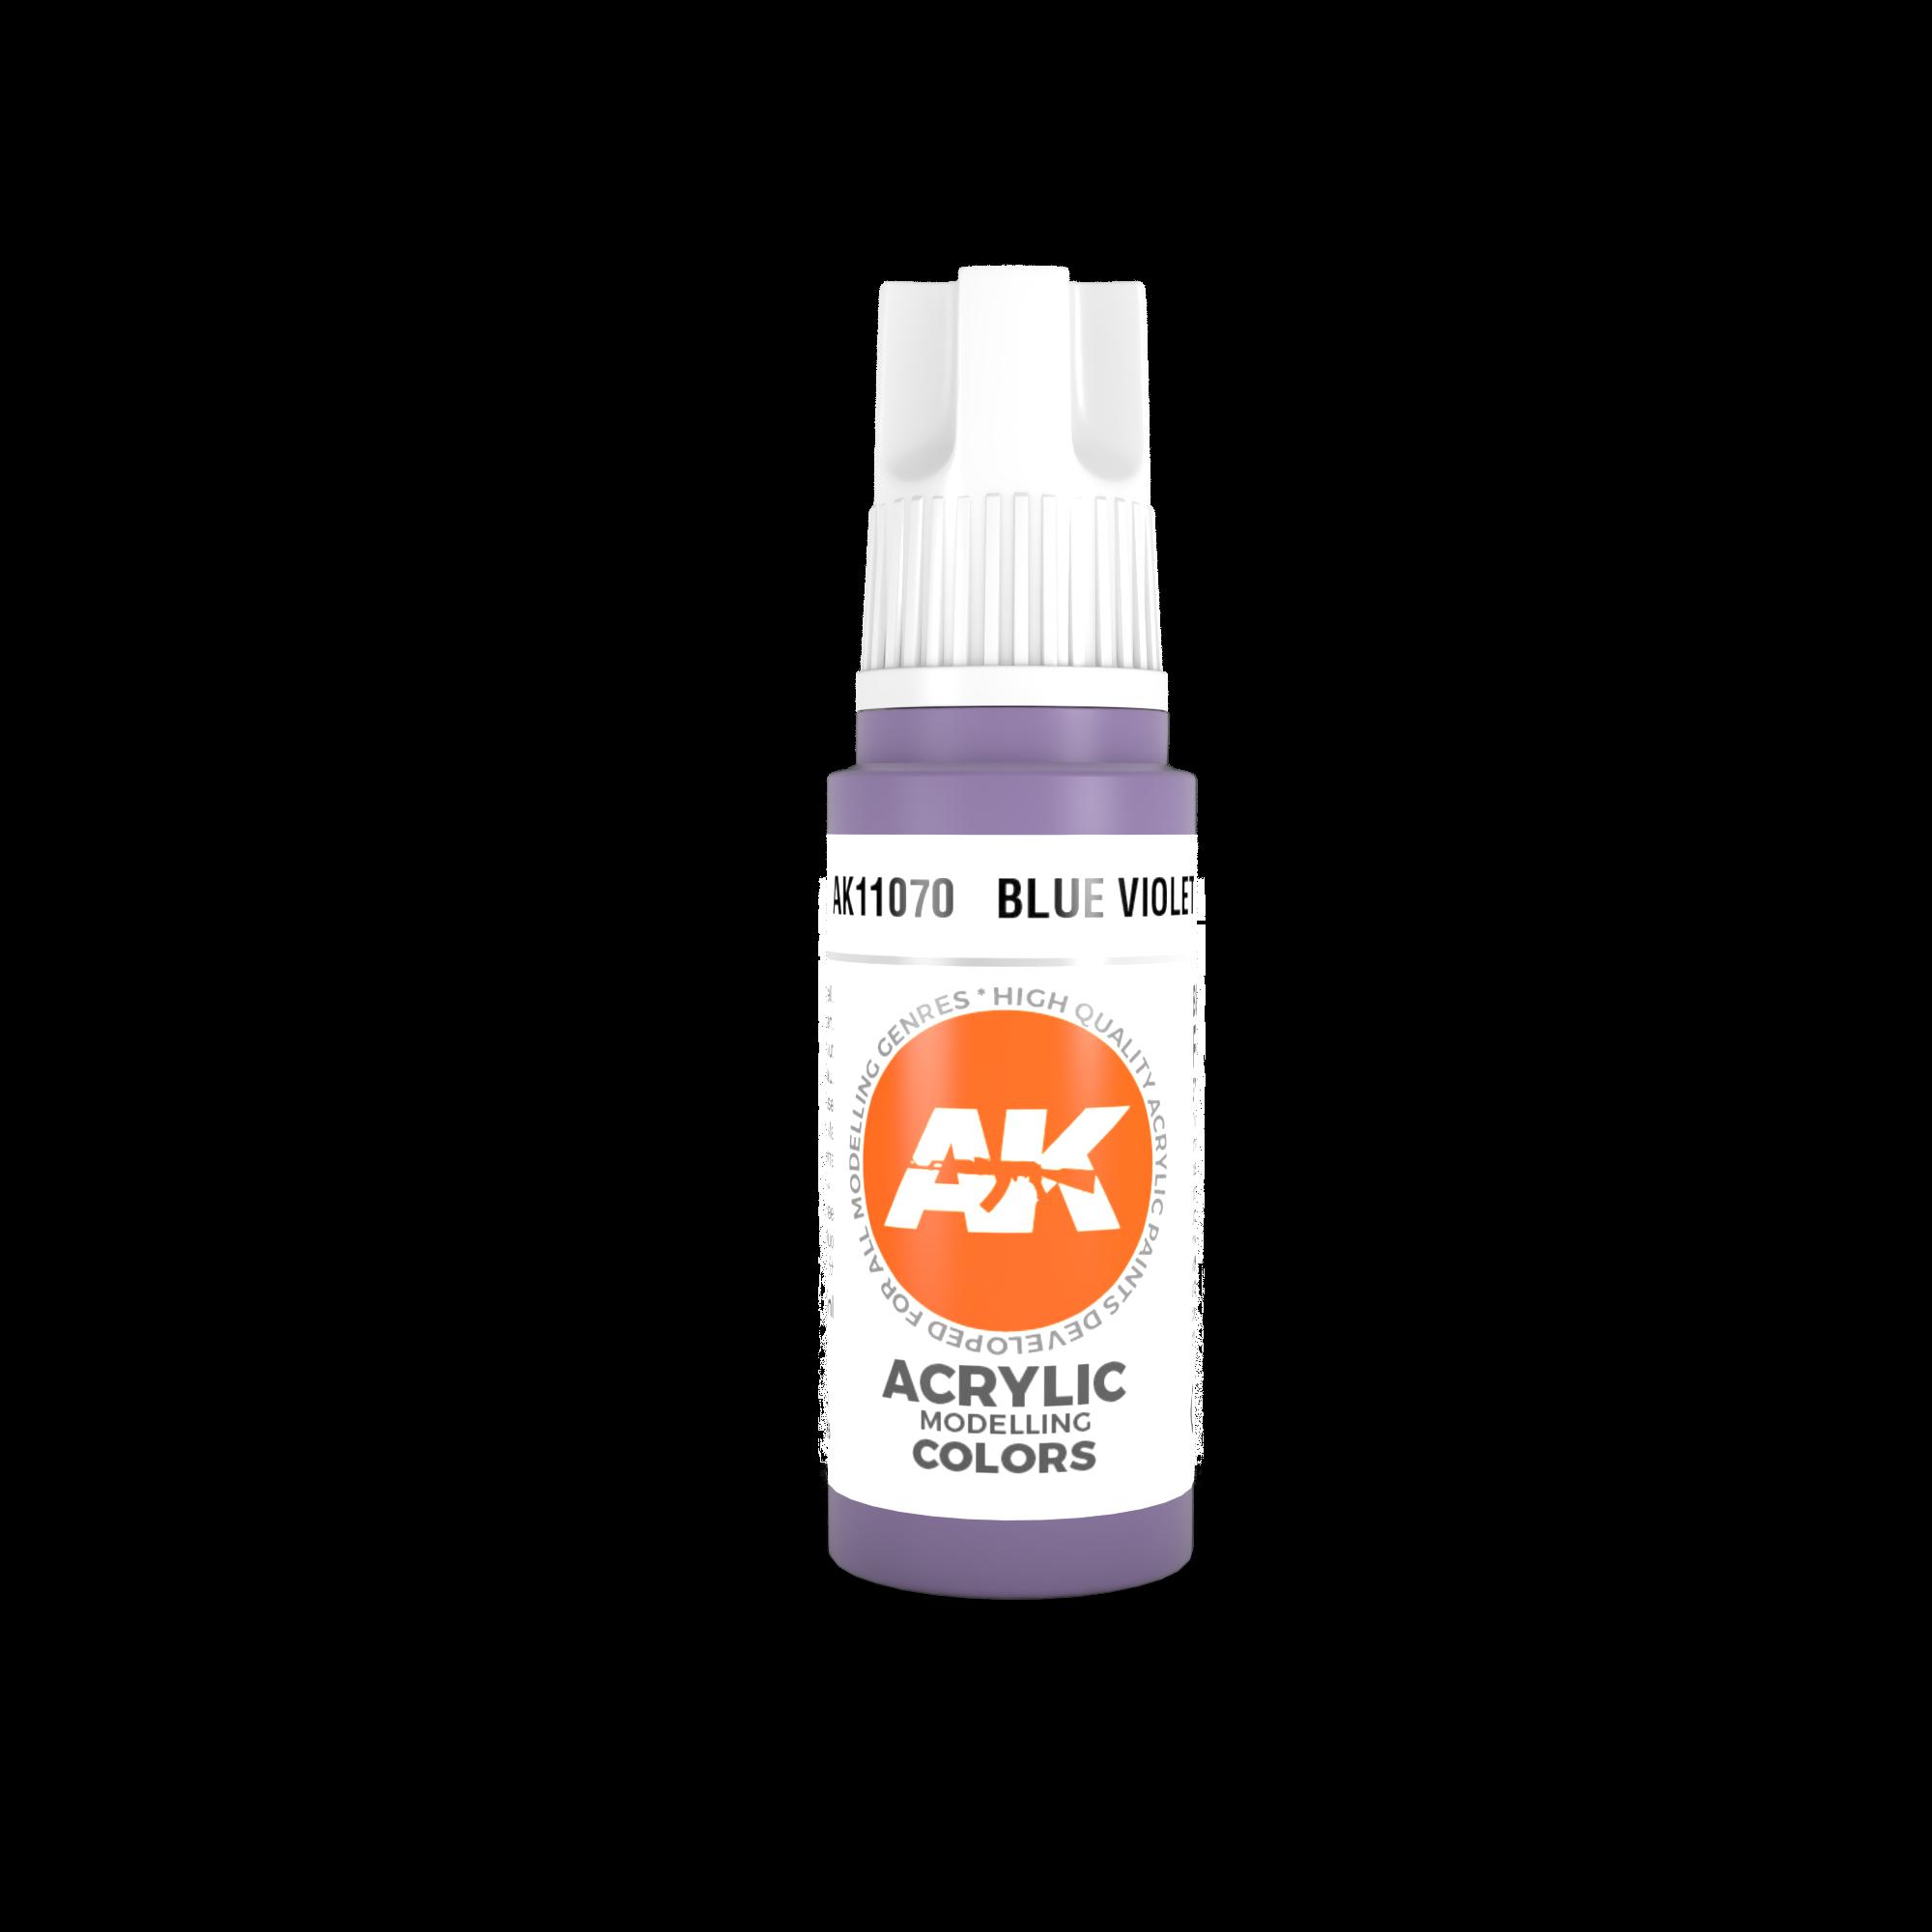 AK-Interactive Blue Violet Acrylic Modelling Color - 17ml - AK-11070